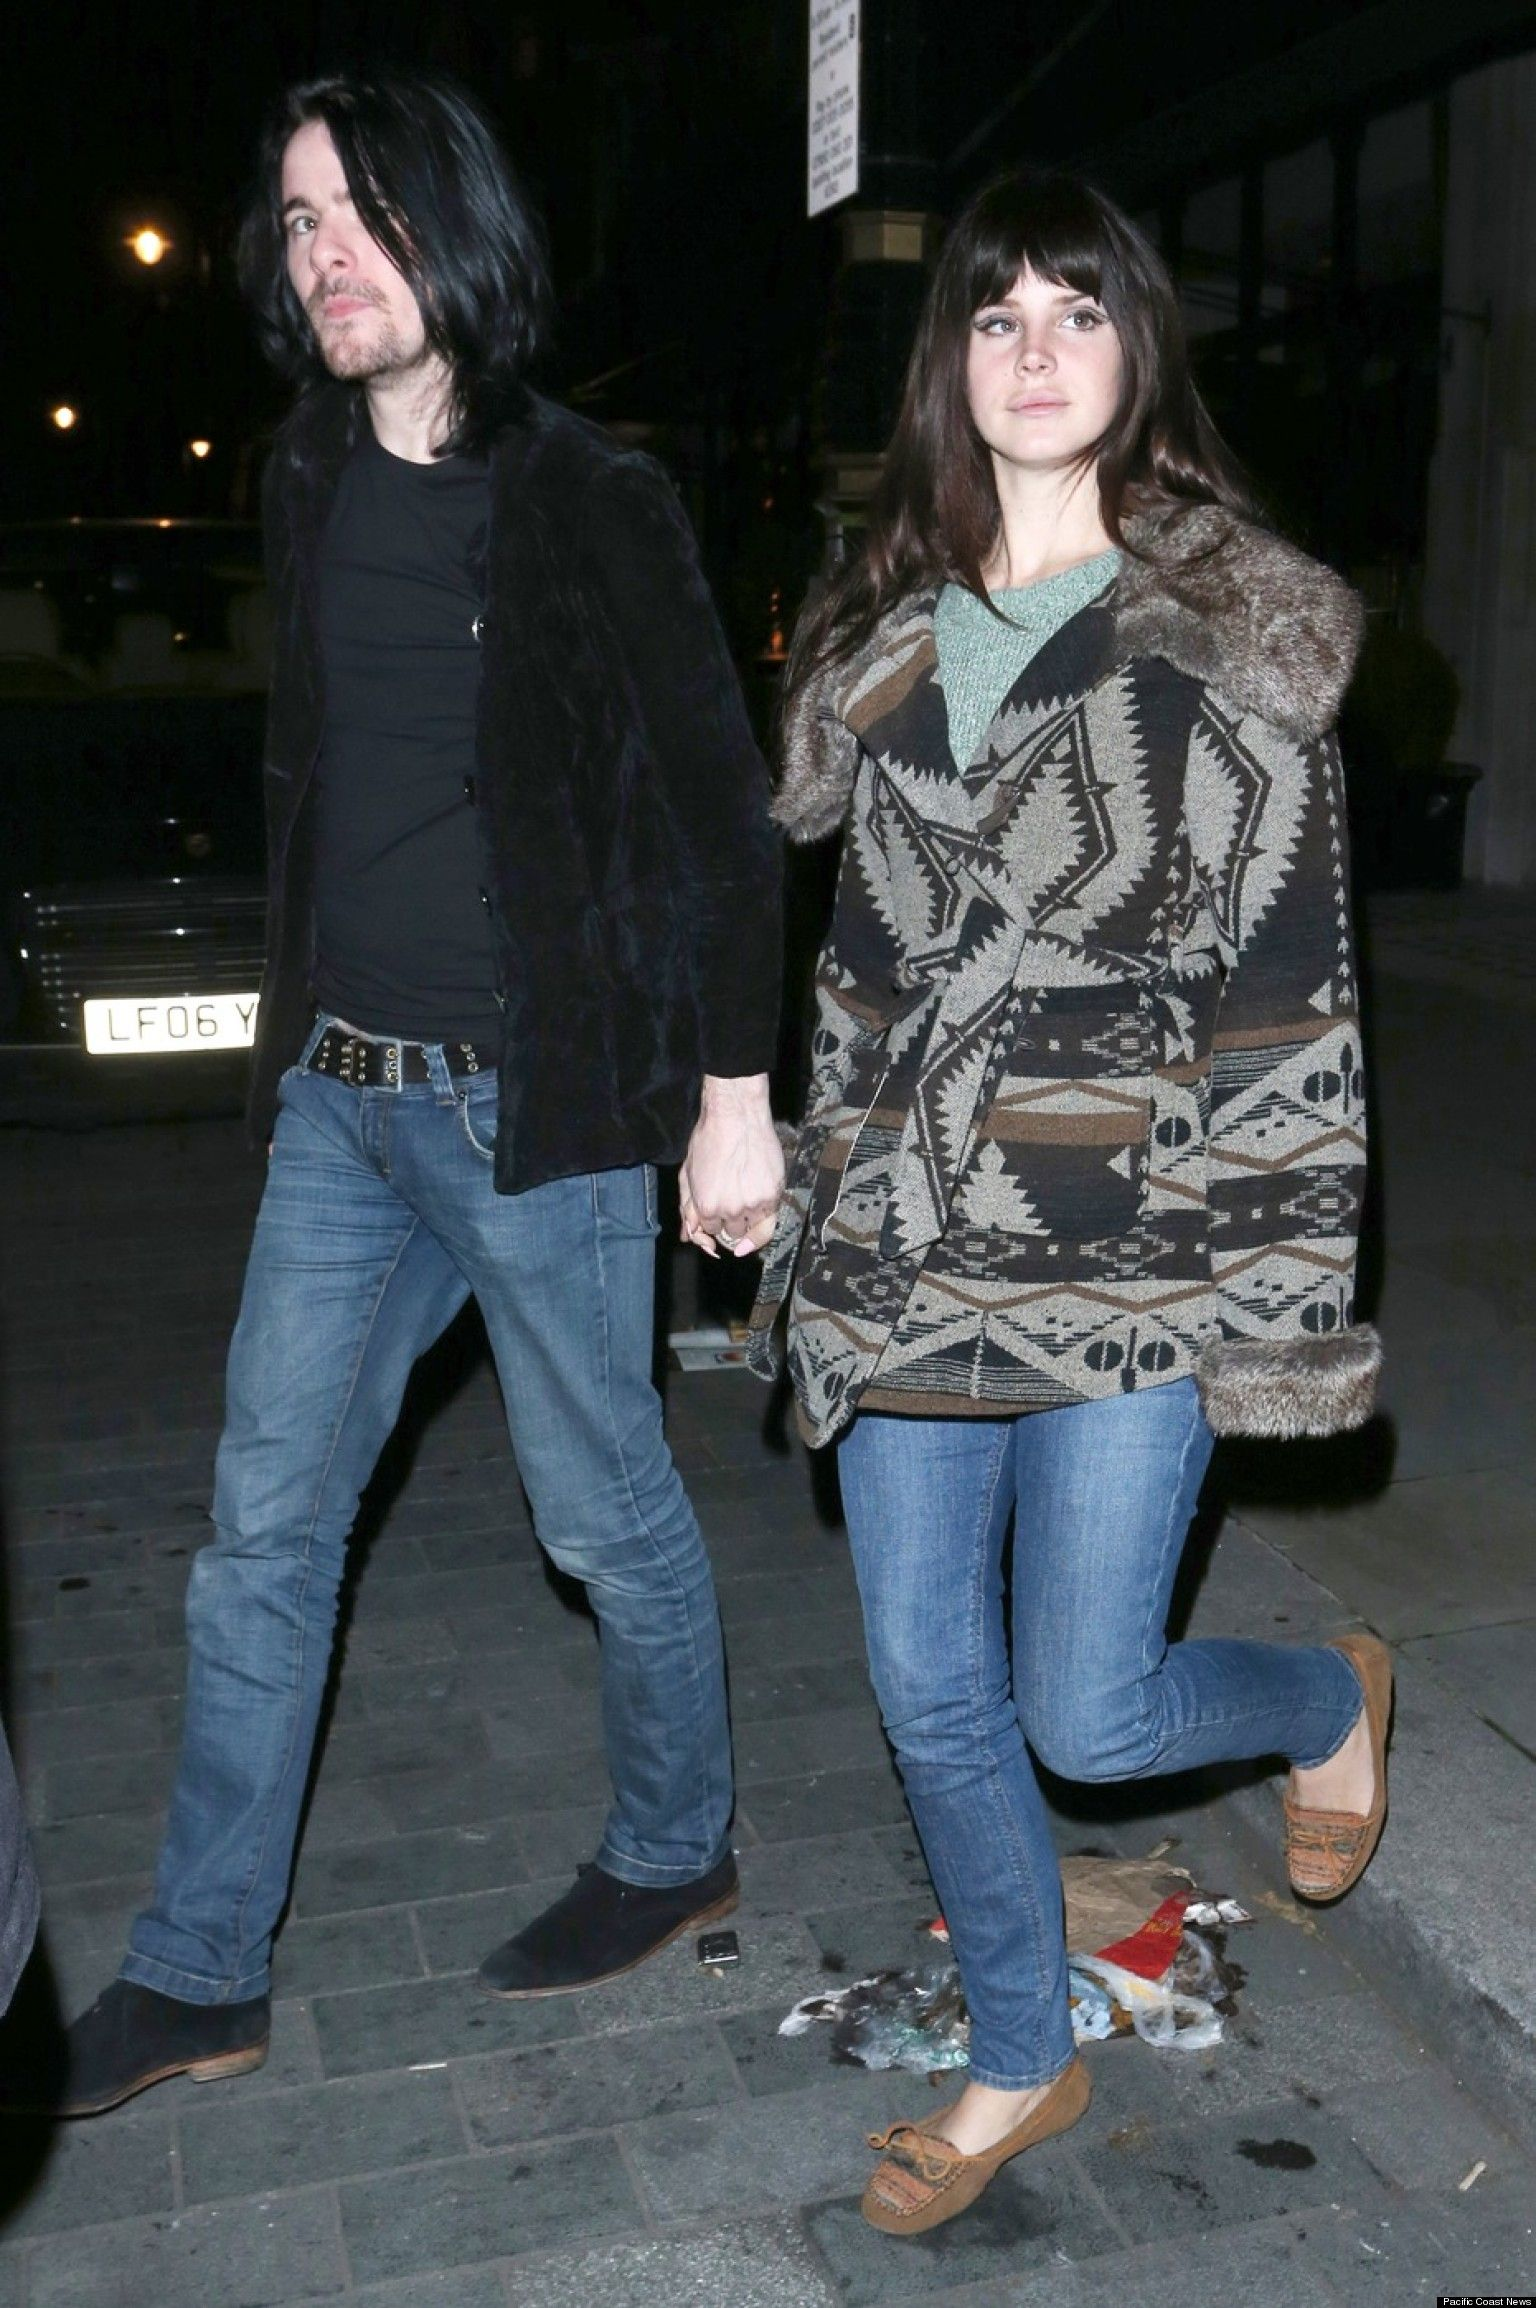 Photo Lana Del Rey Steps Out With Boyfriend Lana Del Rey Lana Del Clothes